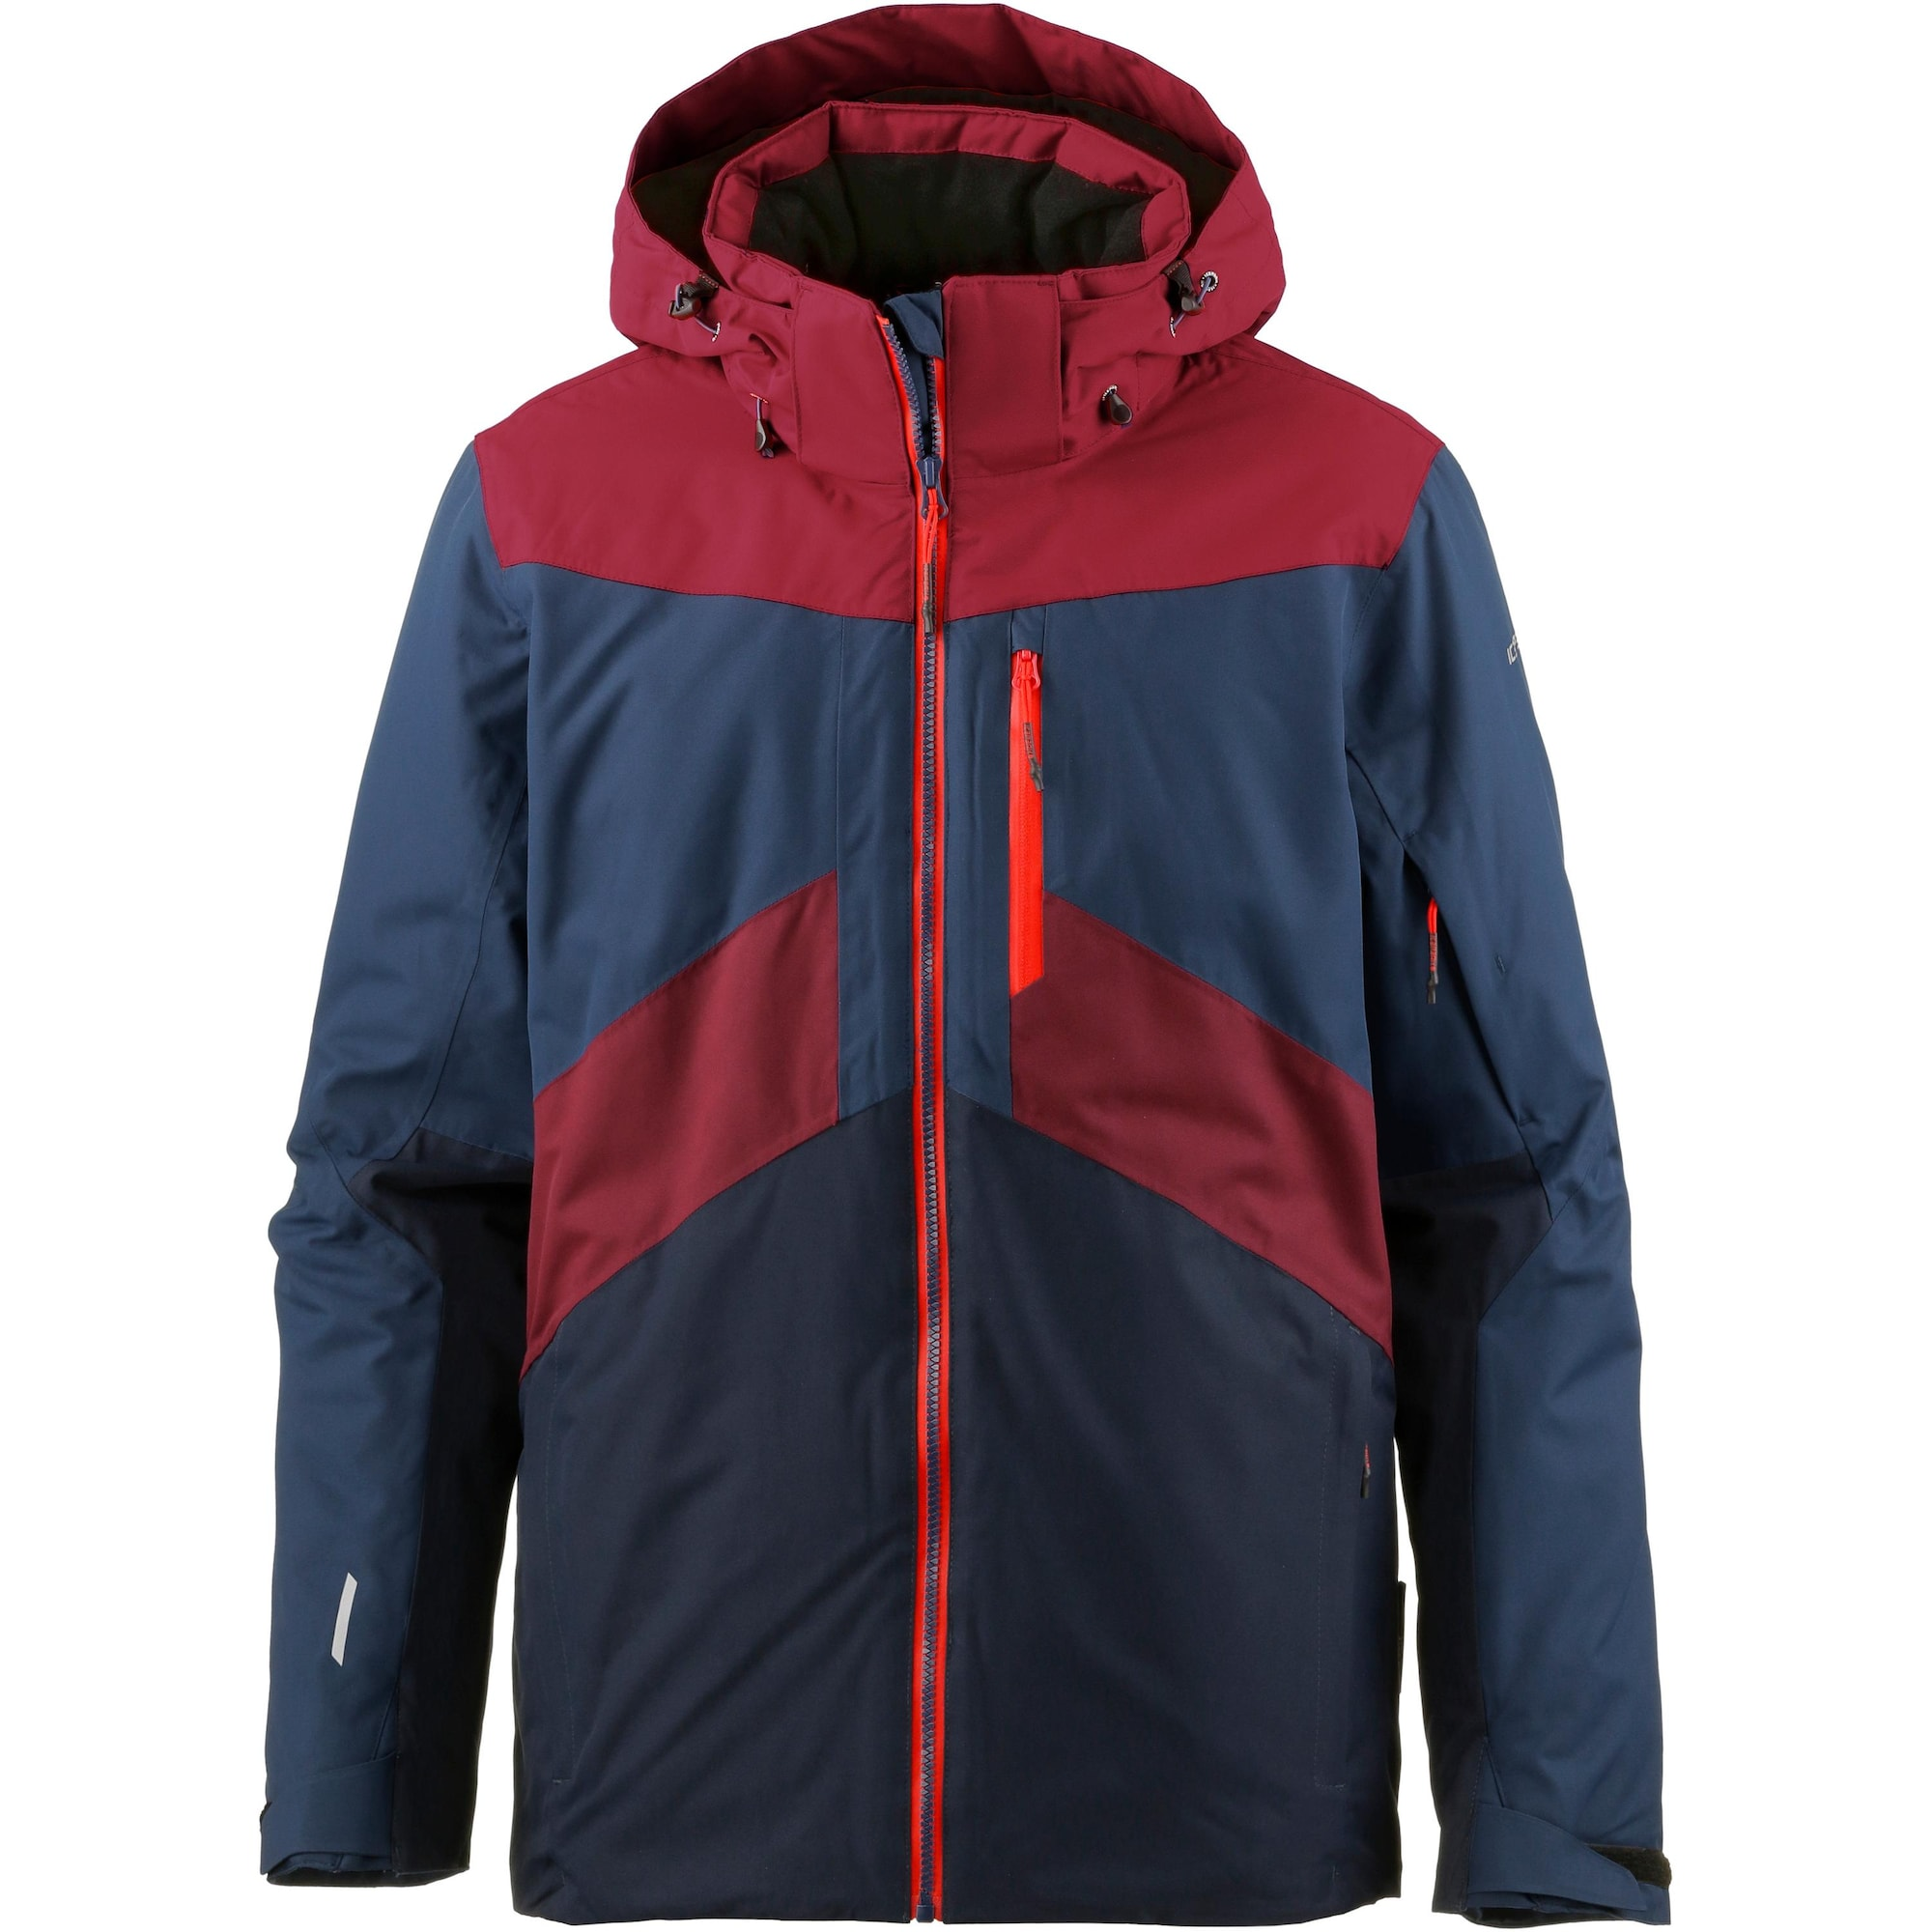 Sportovní bunda KRIS marine modrá červená ICEPEAK